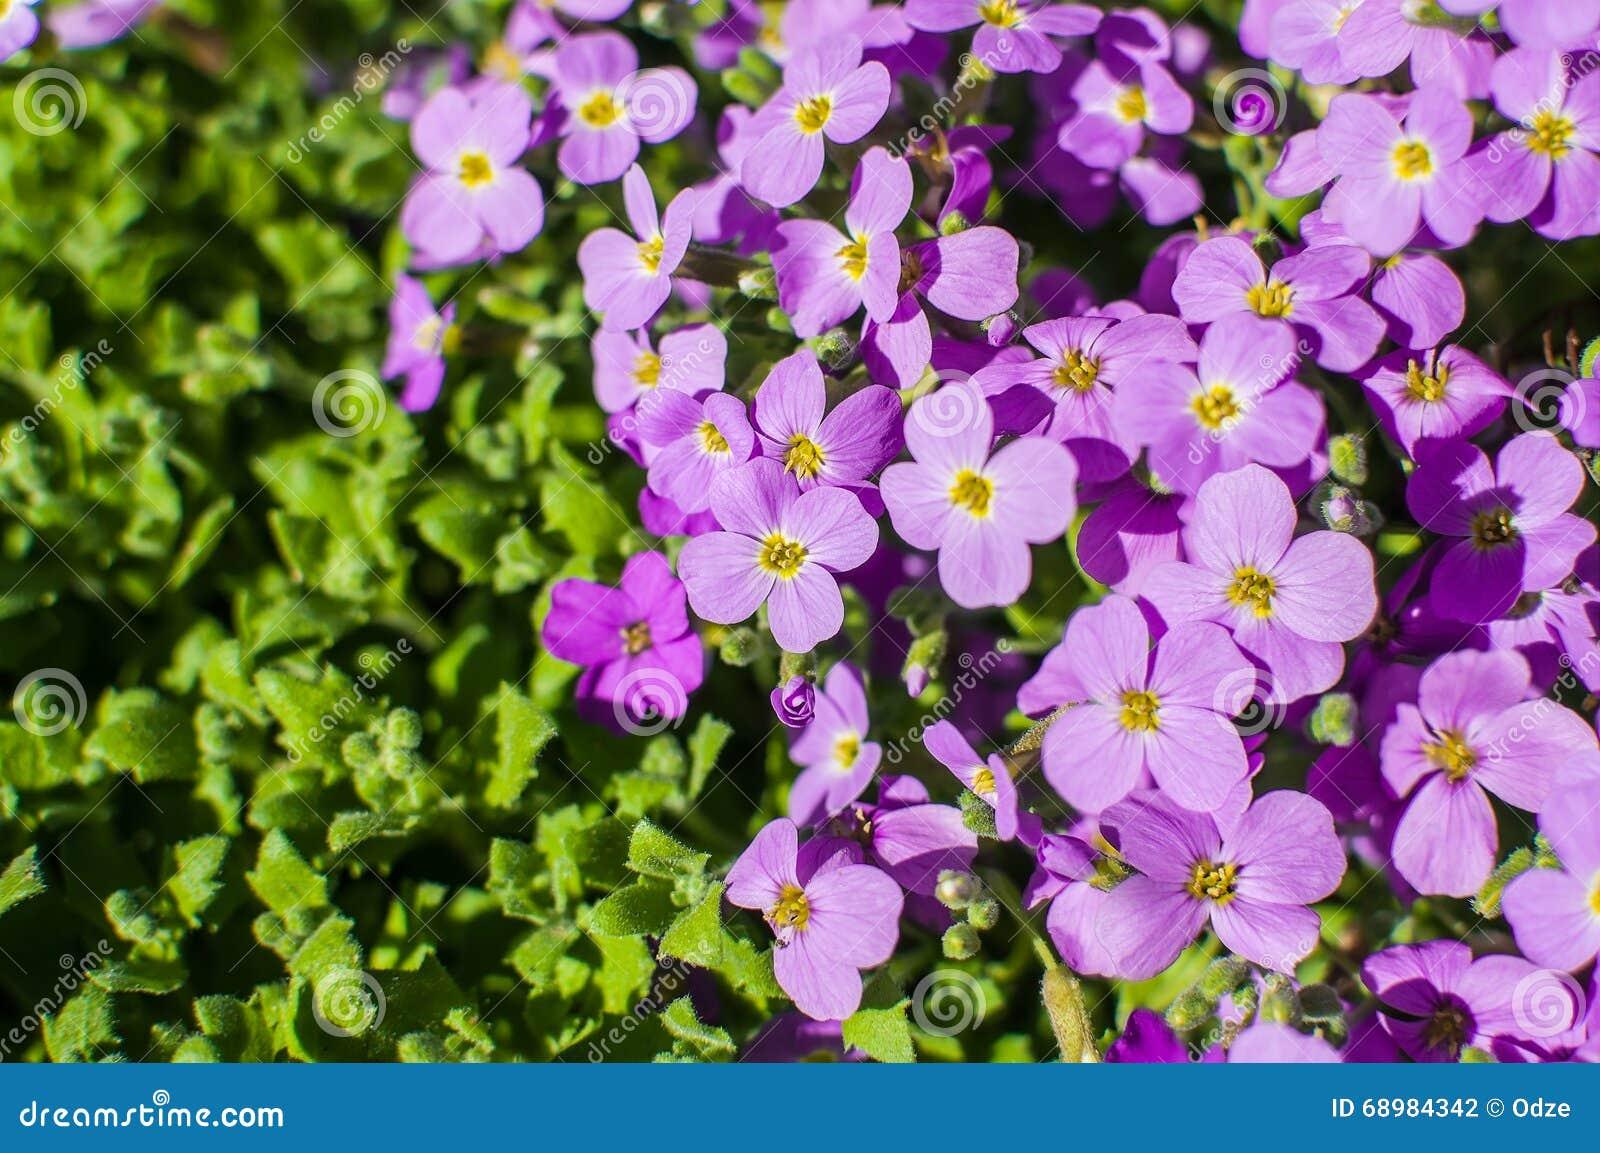 Pink Moss Phlox Flowers Stock Photo Image Of Botanical 68984342